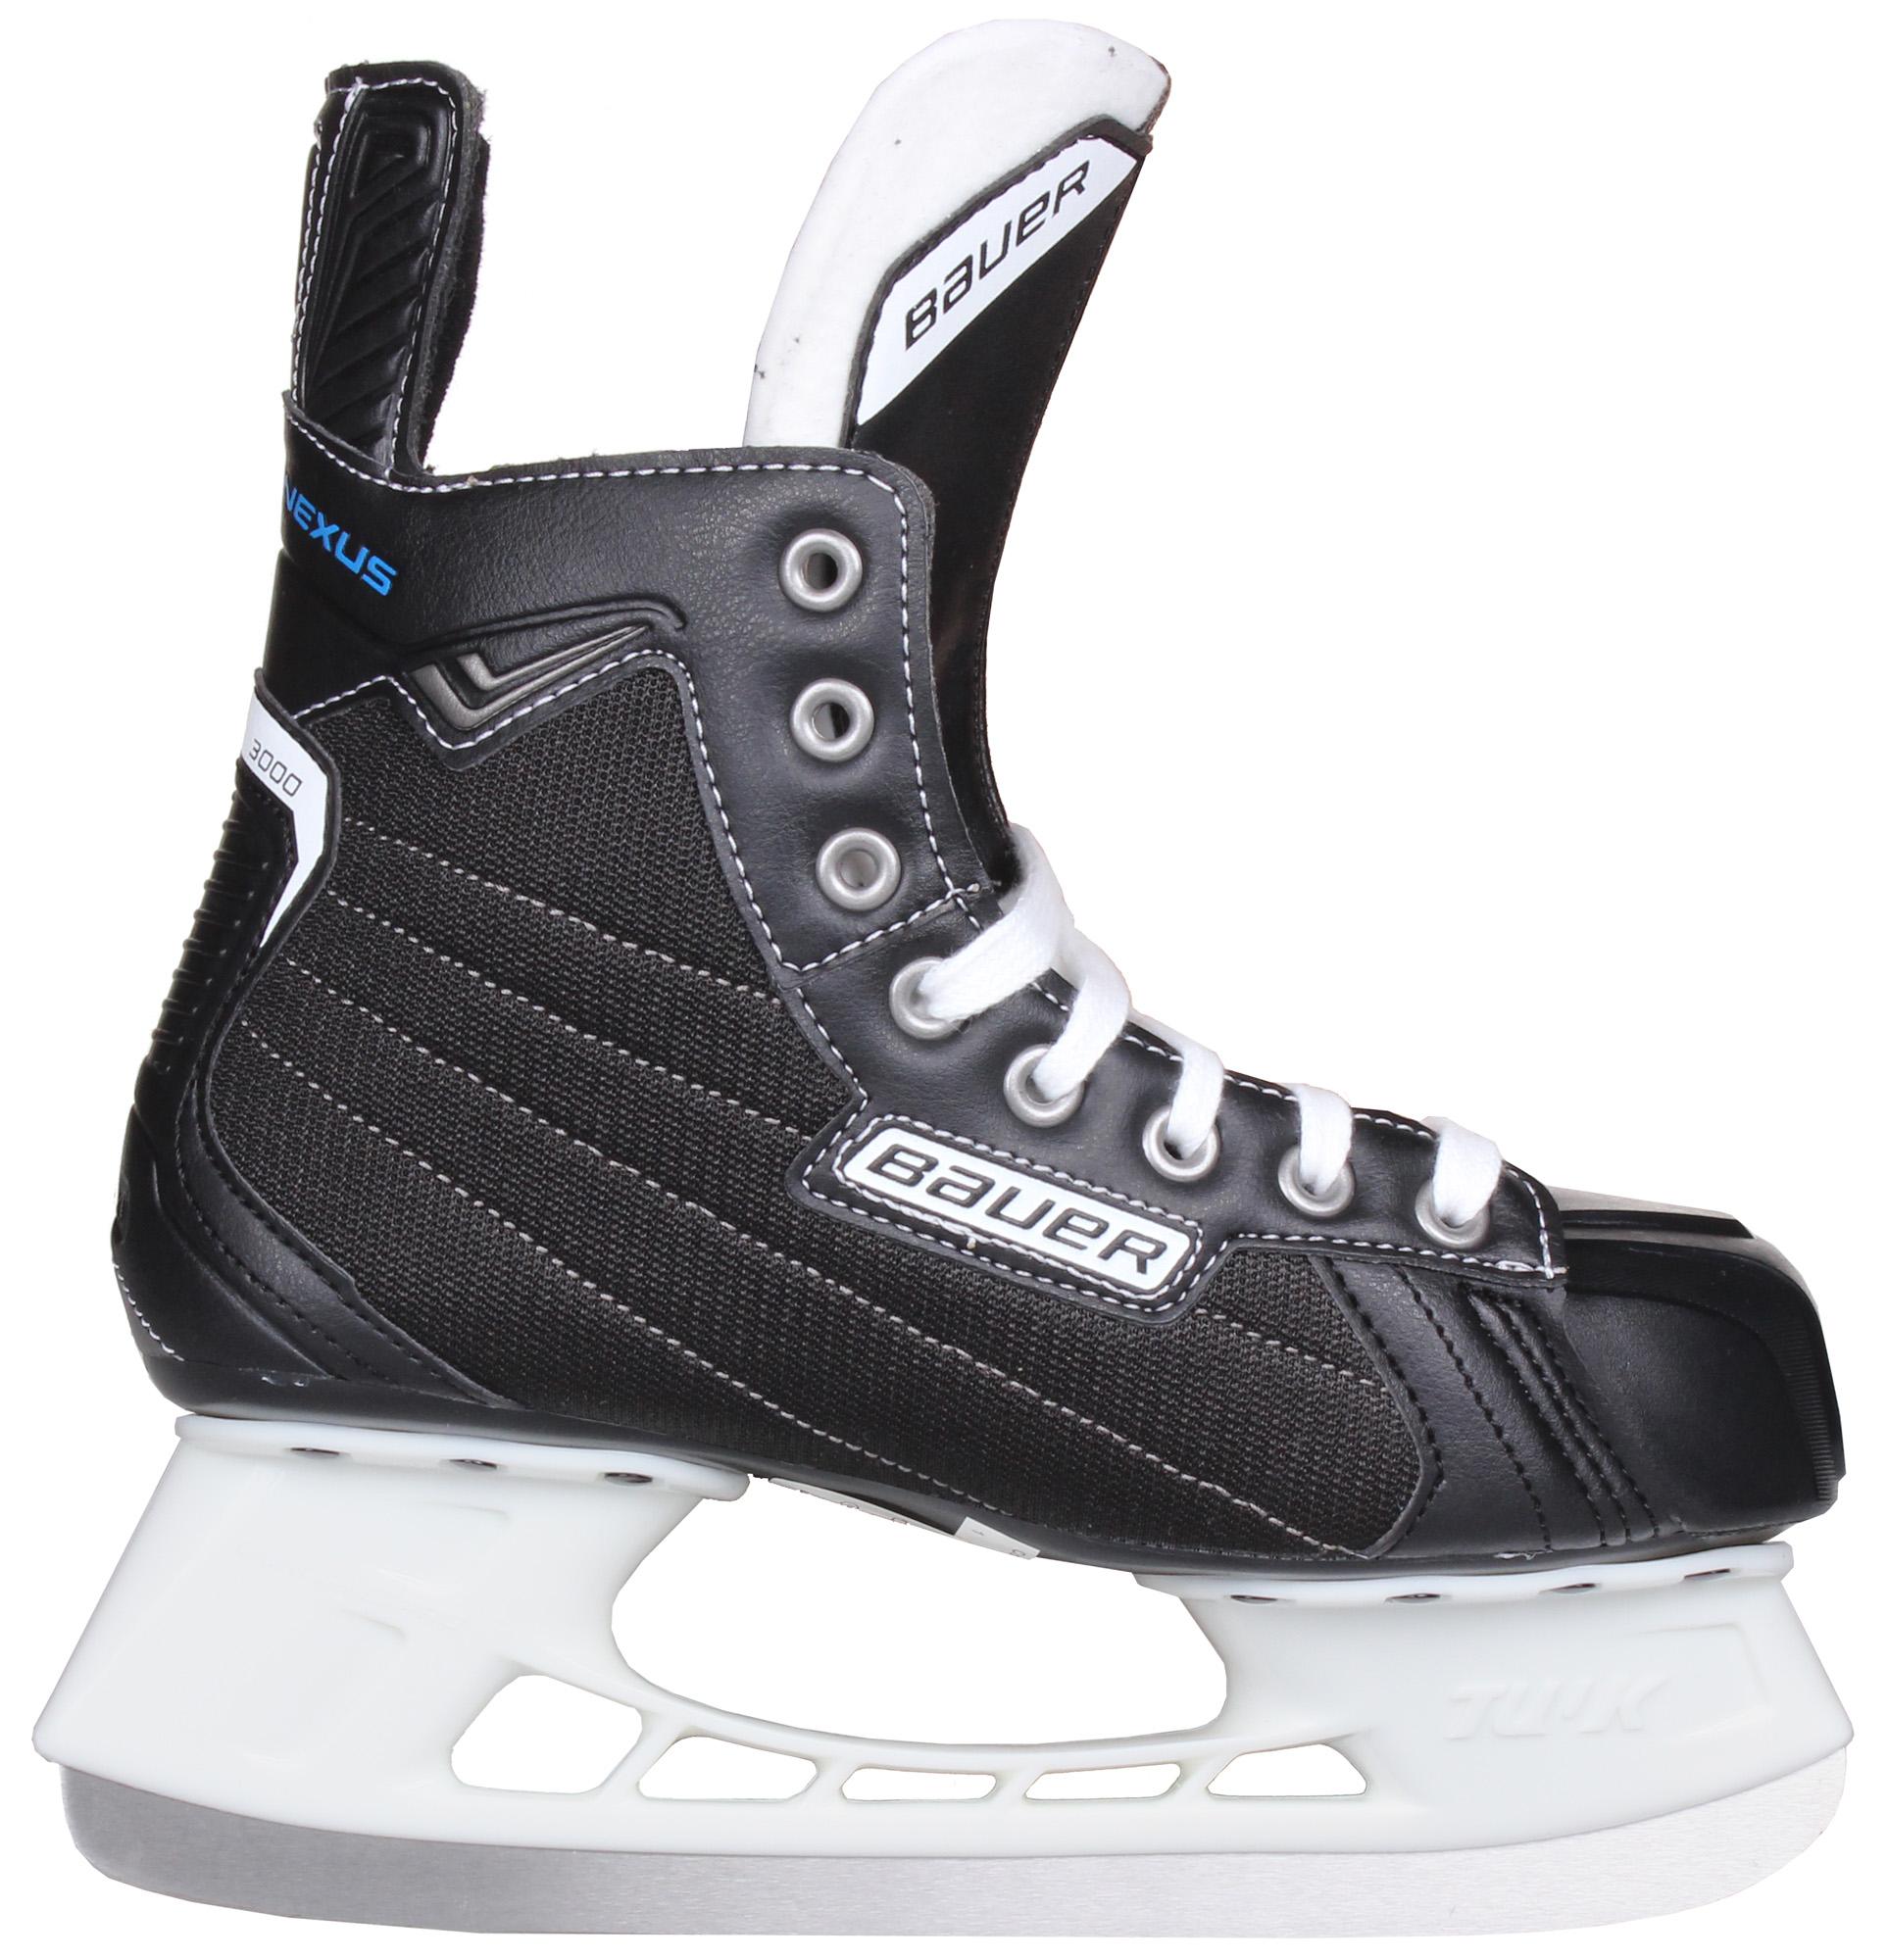 BAUER Nexus 3000 JR juniorské hokejové brusle, šíře R37,5